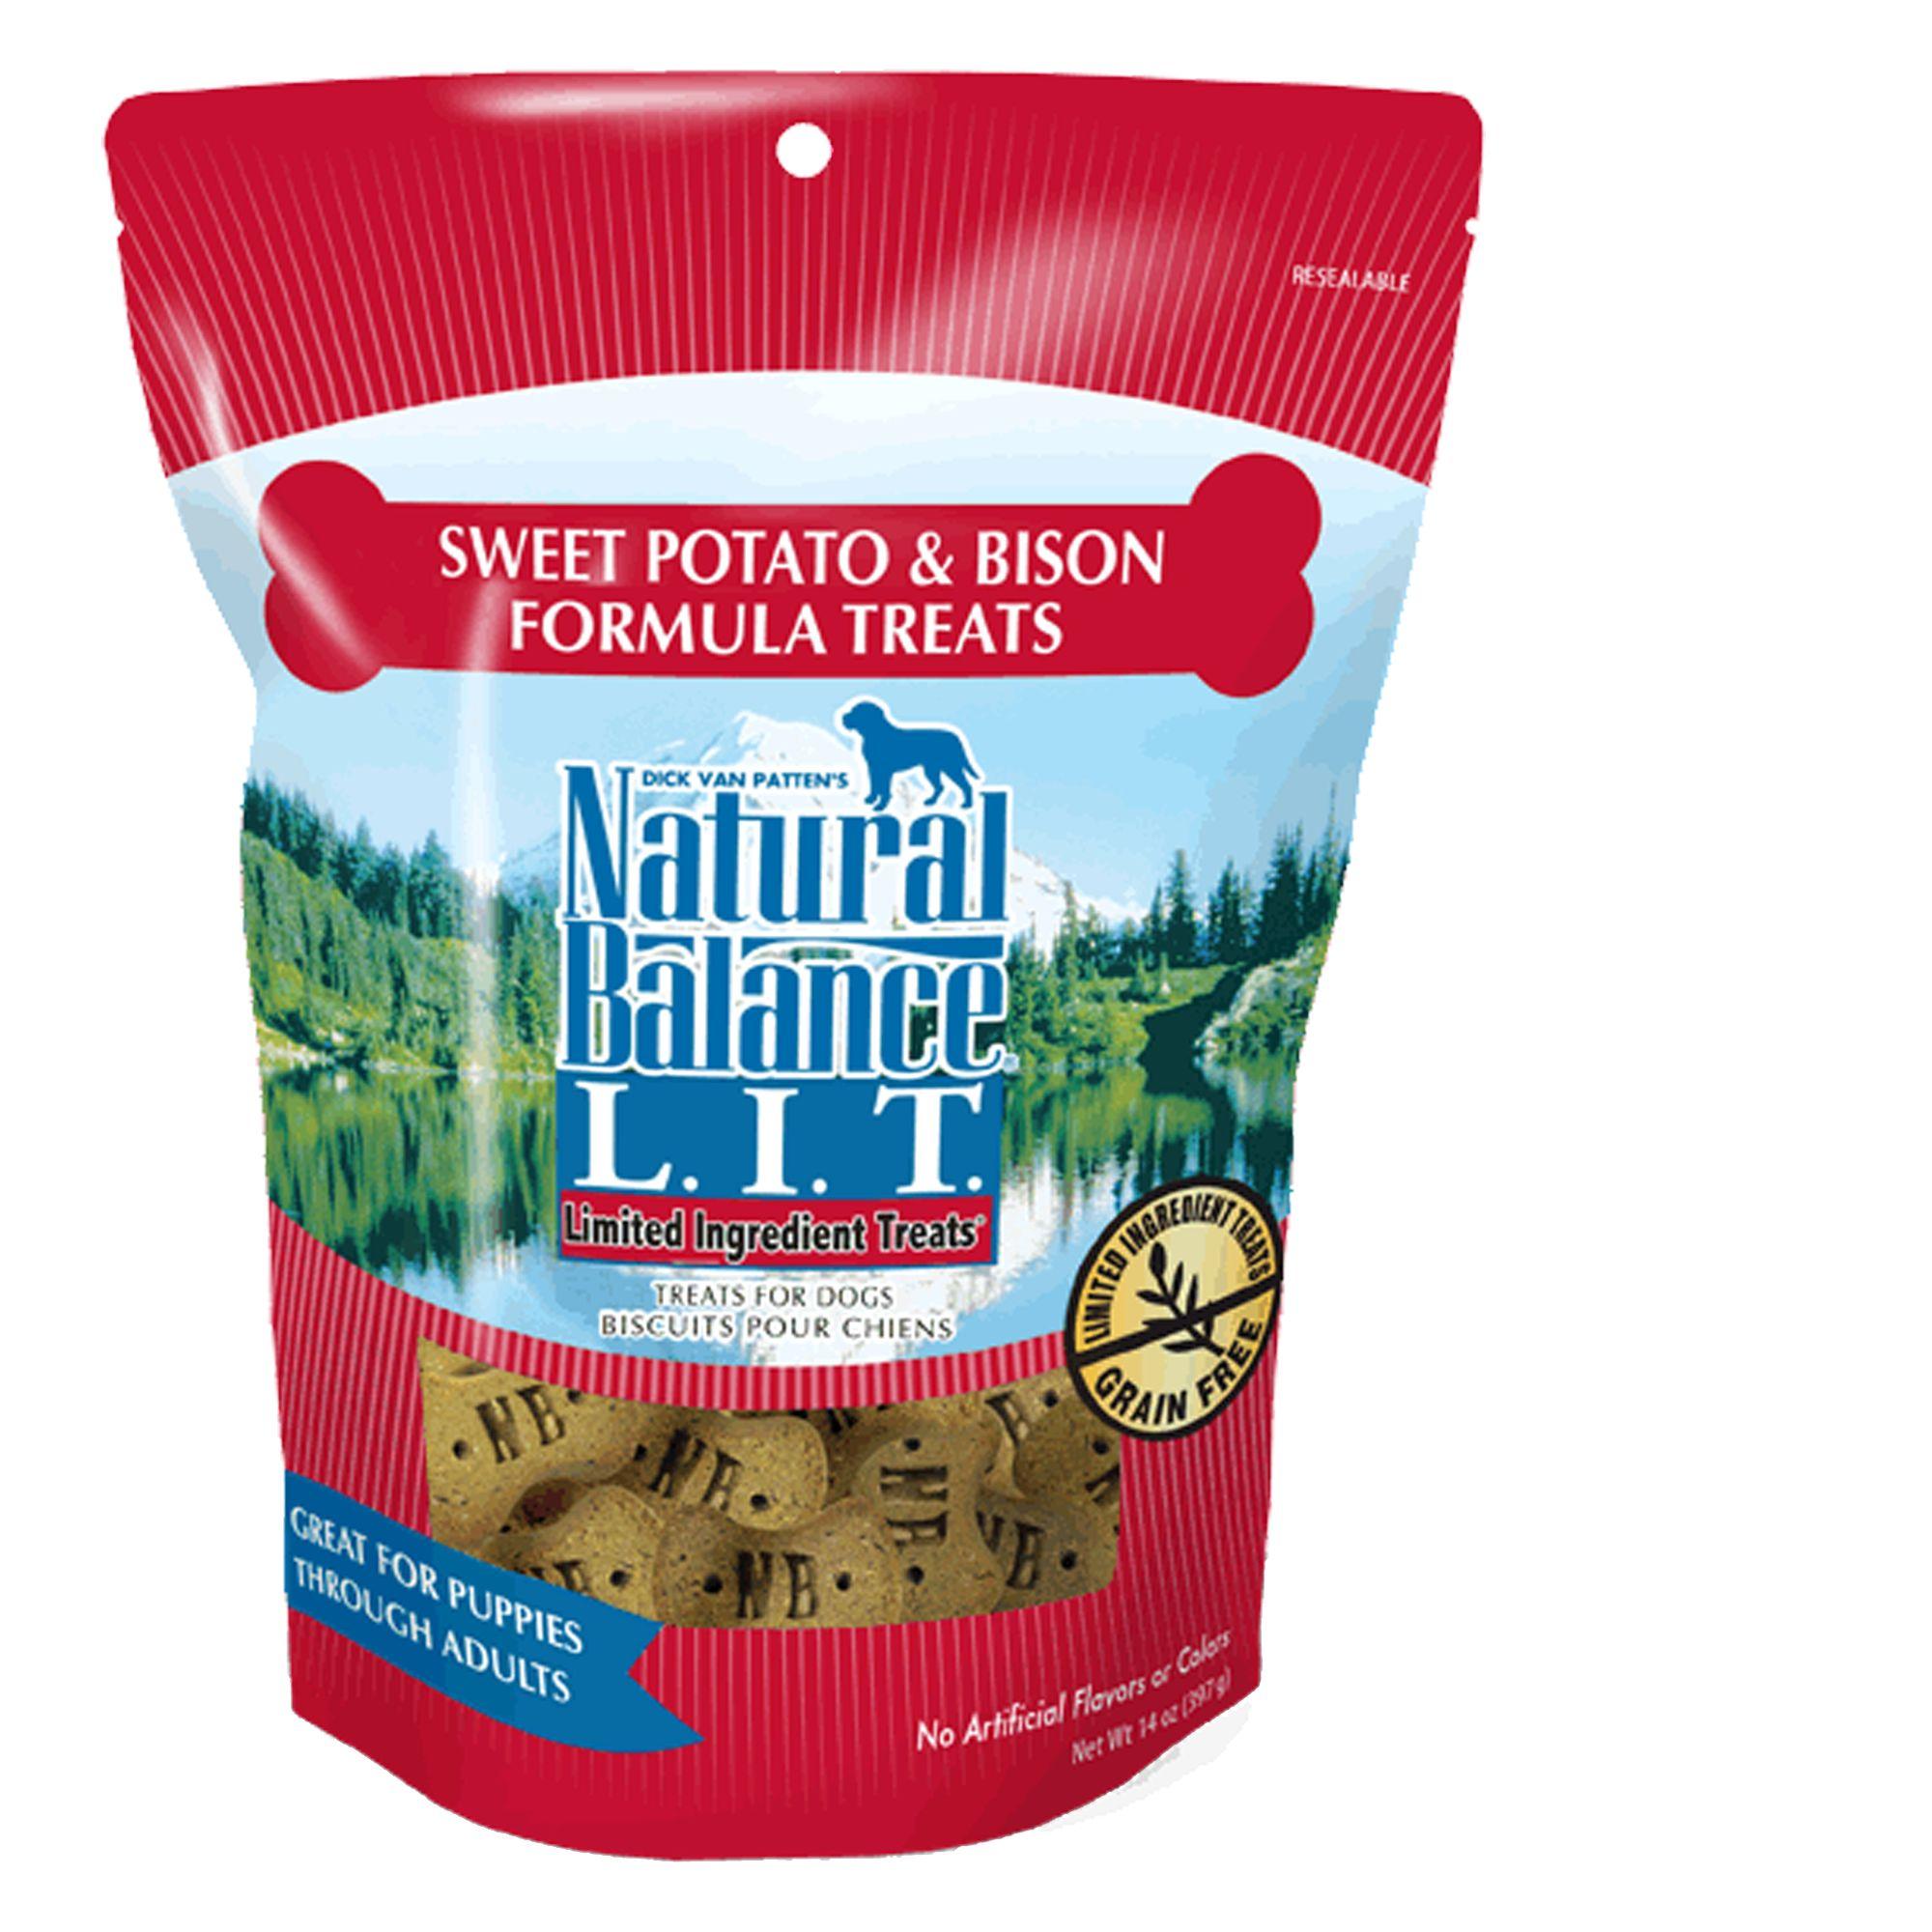 Natural Balance Limited Ingredient Treats Dog Treat - Grain Free, Sweet Potato and Bison size: 14 Oz, Sweet Potato & Bison, Dry, Adult, Dried Potatoes